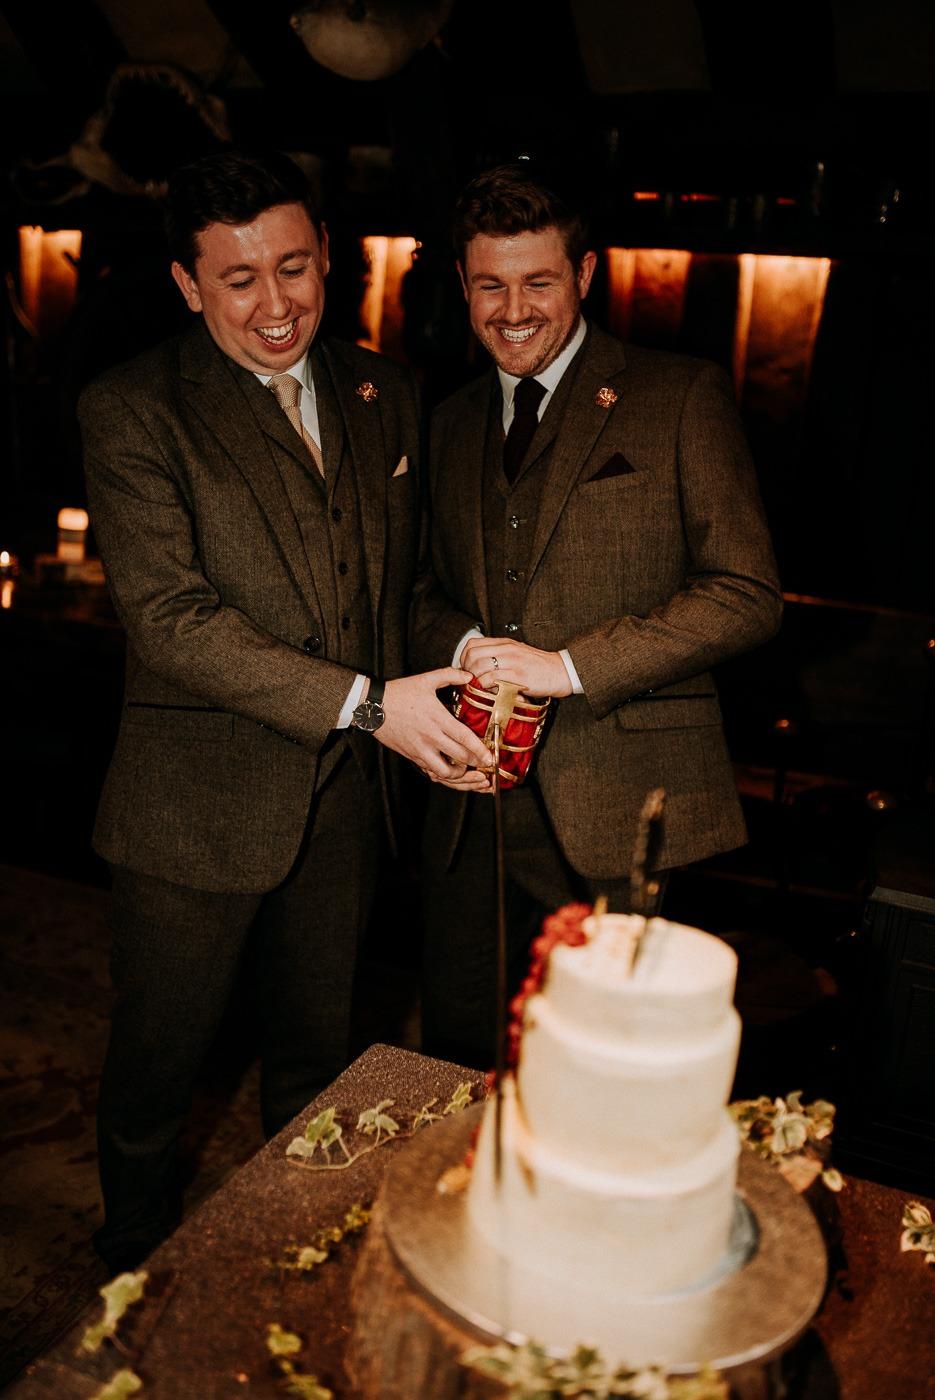 Oleg Frish and woman cutting a wedding cake